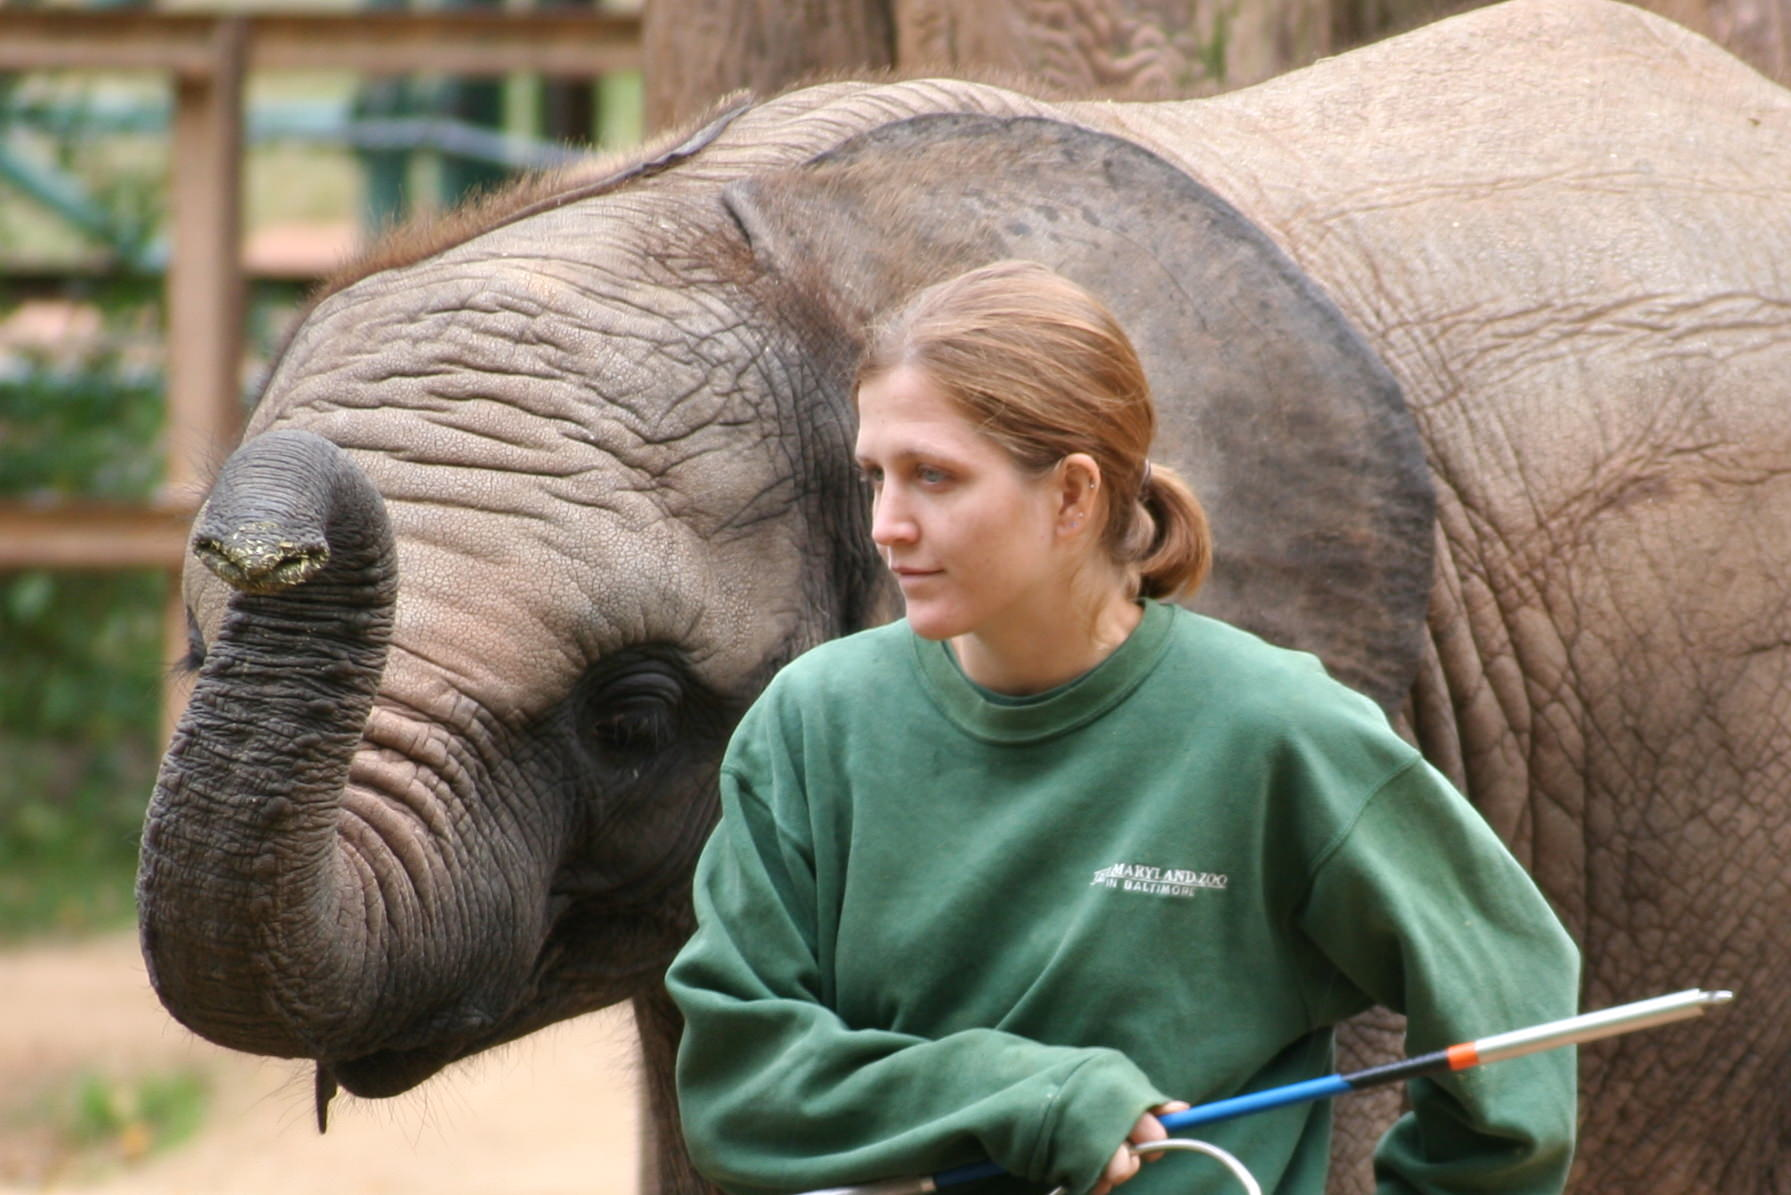 Baby_elephant_and_zoo_keeper_-Maryland_Zoo-8a